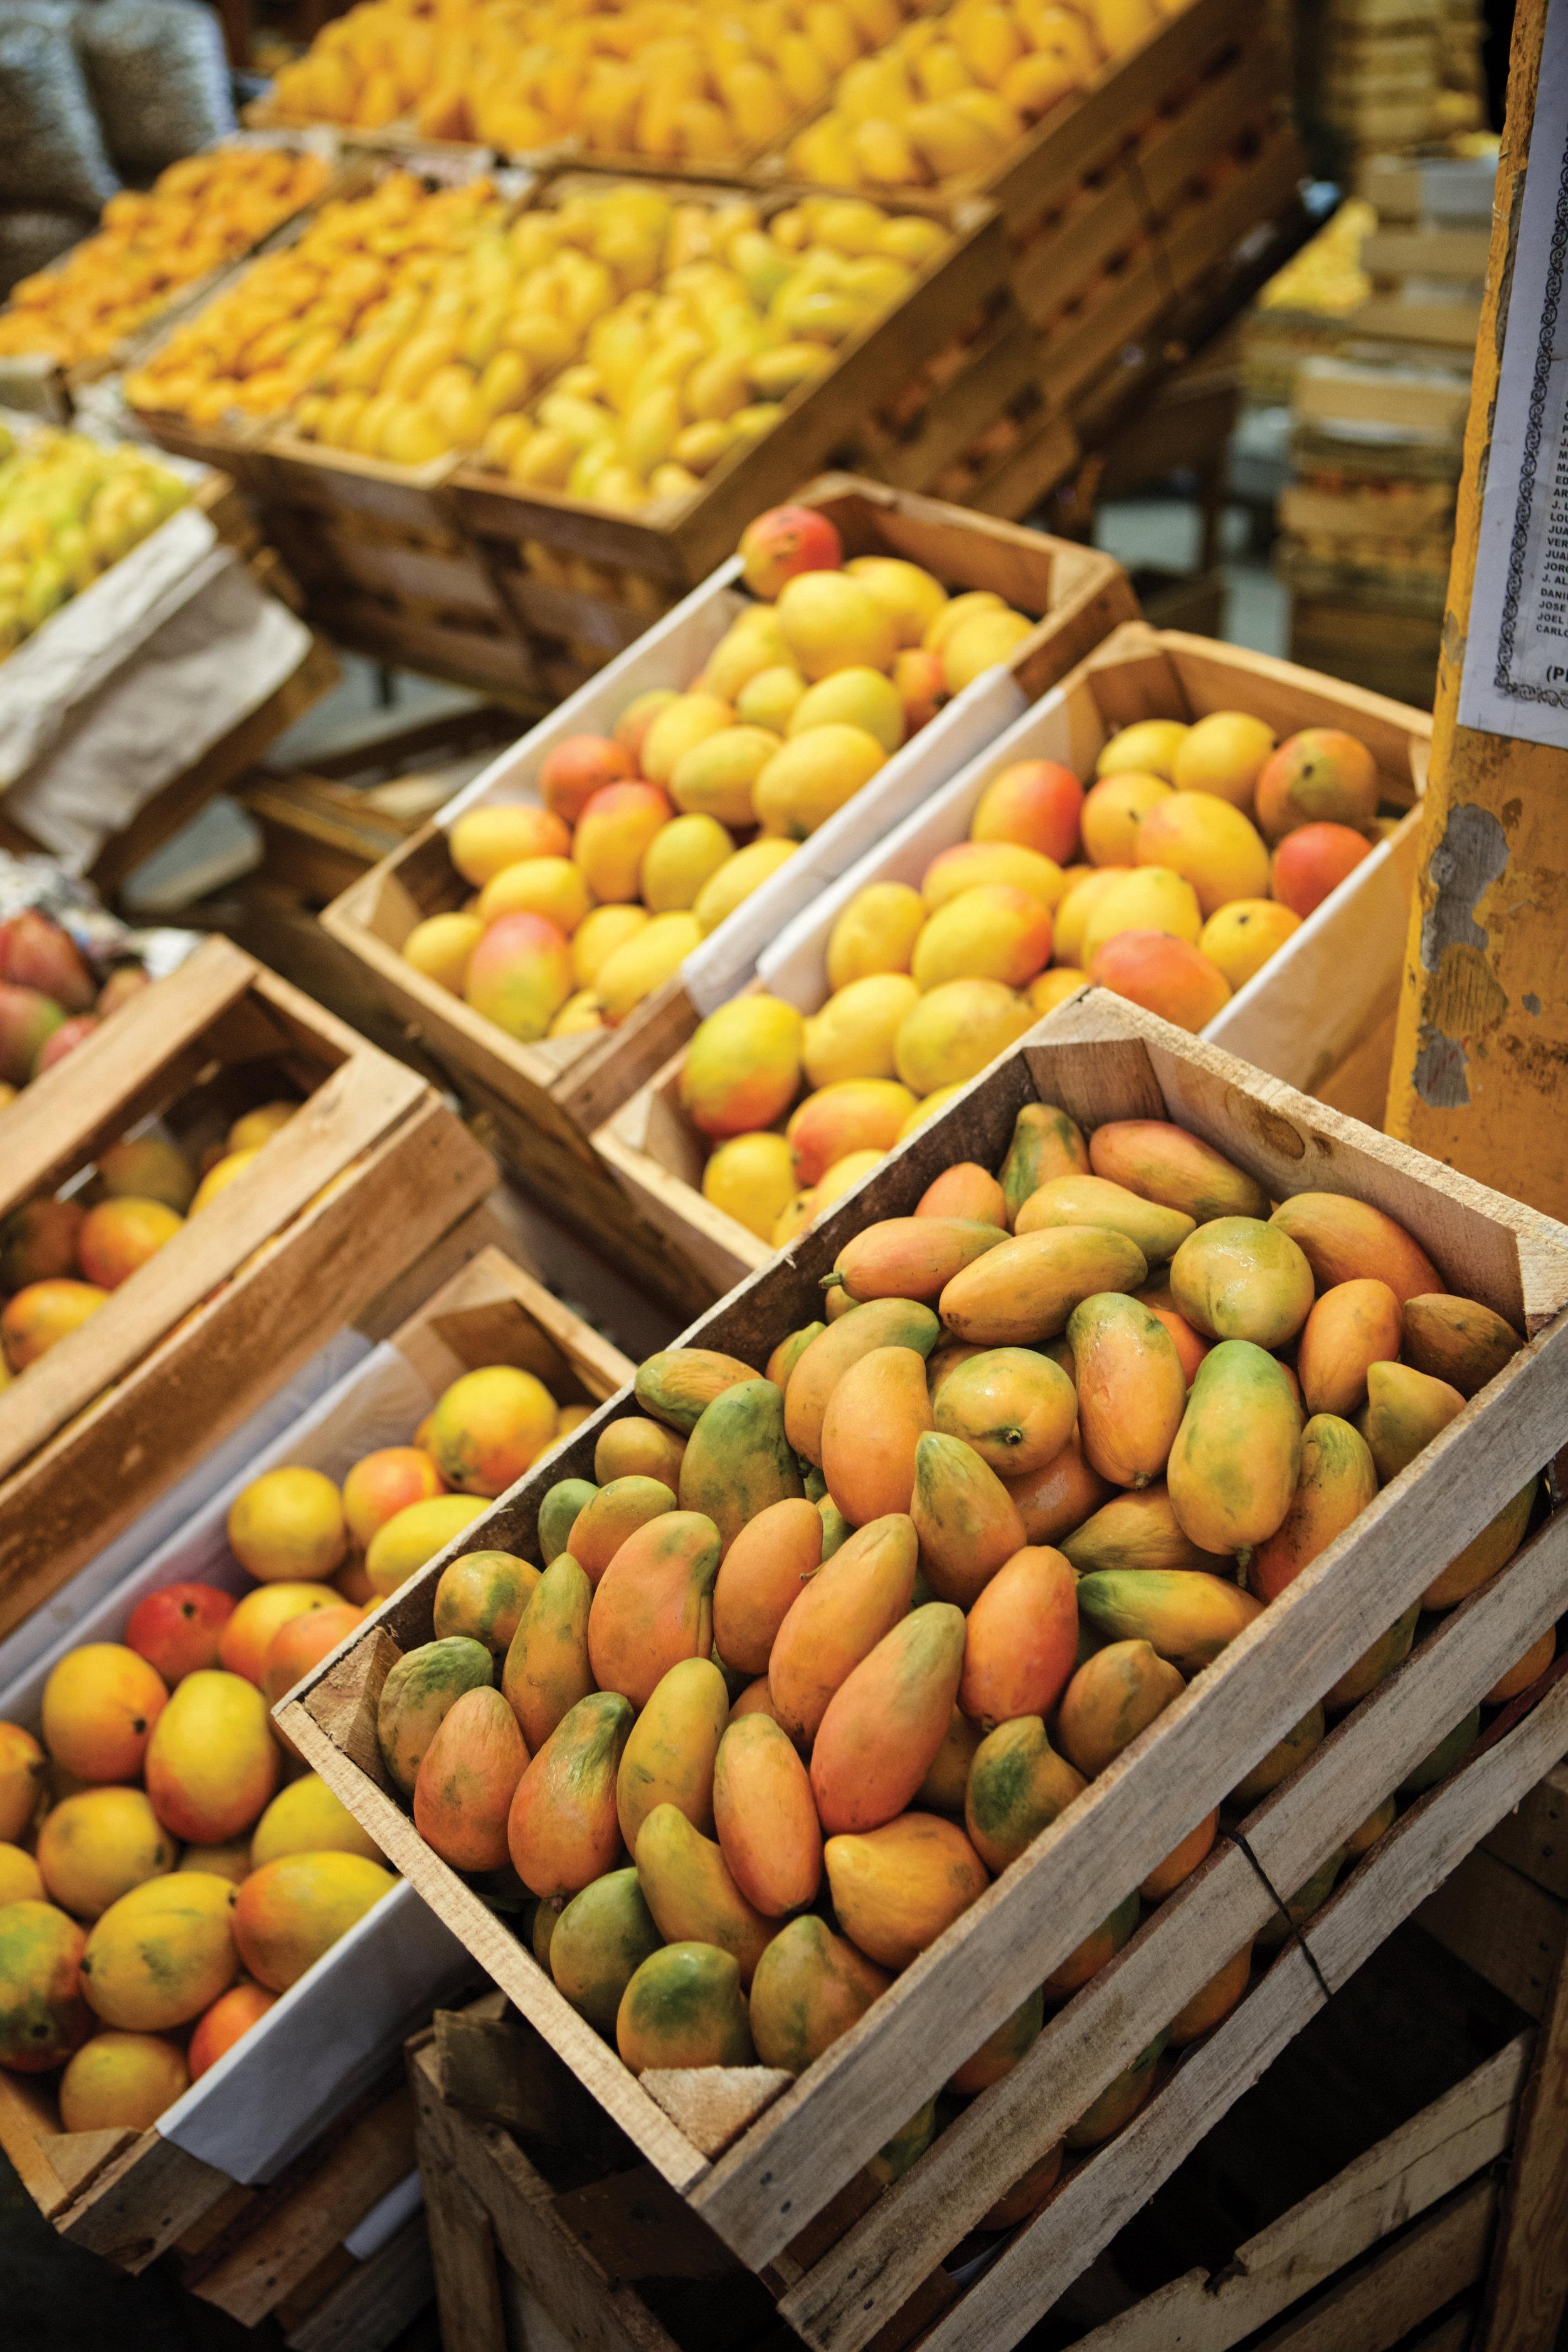 several crates full of mangos